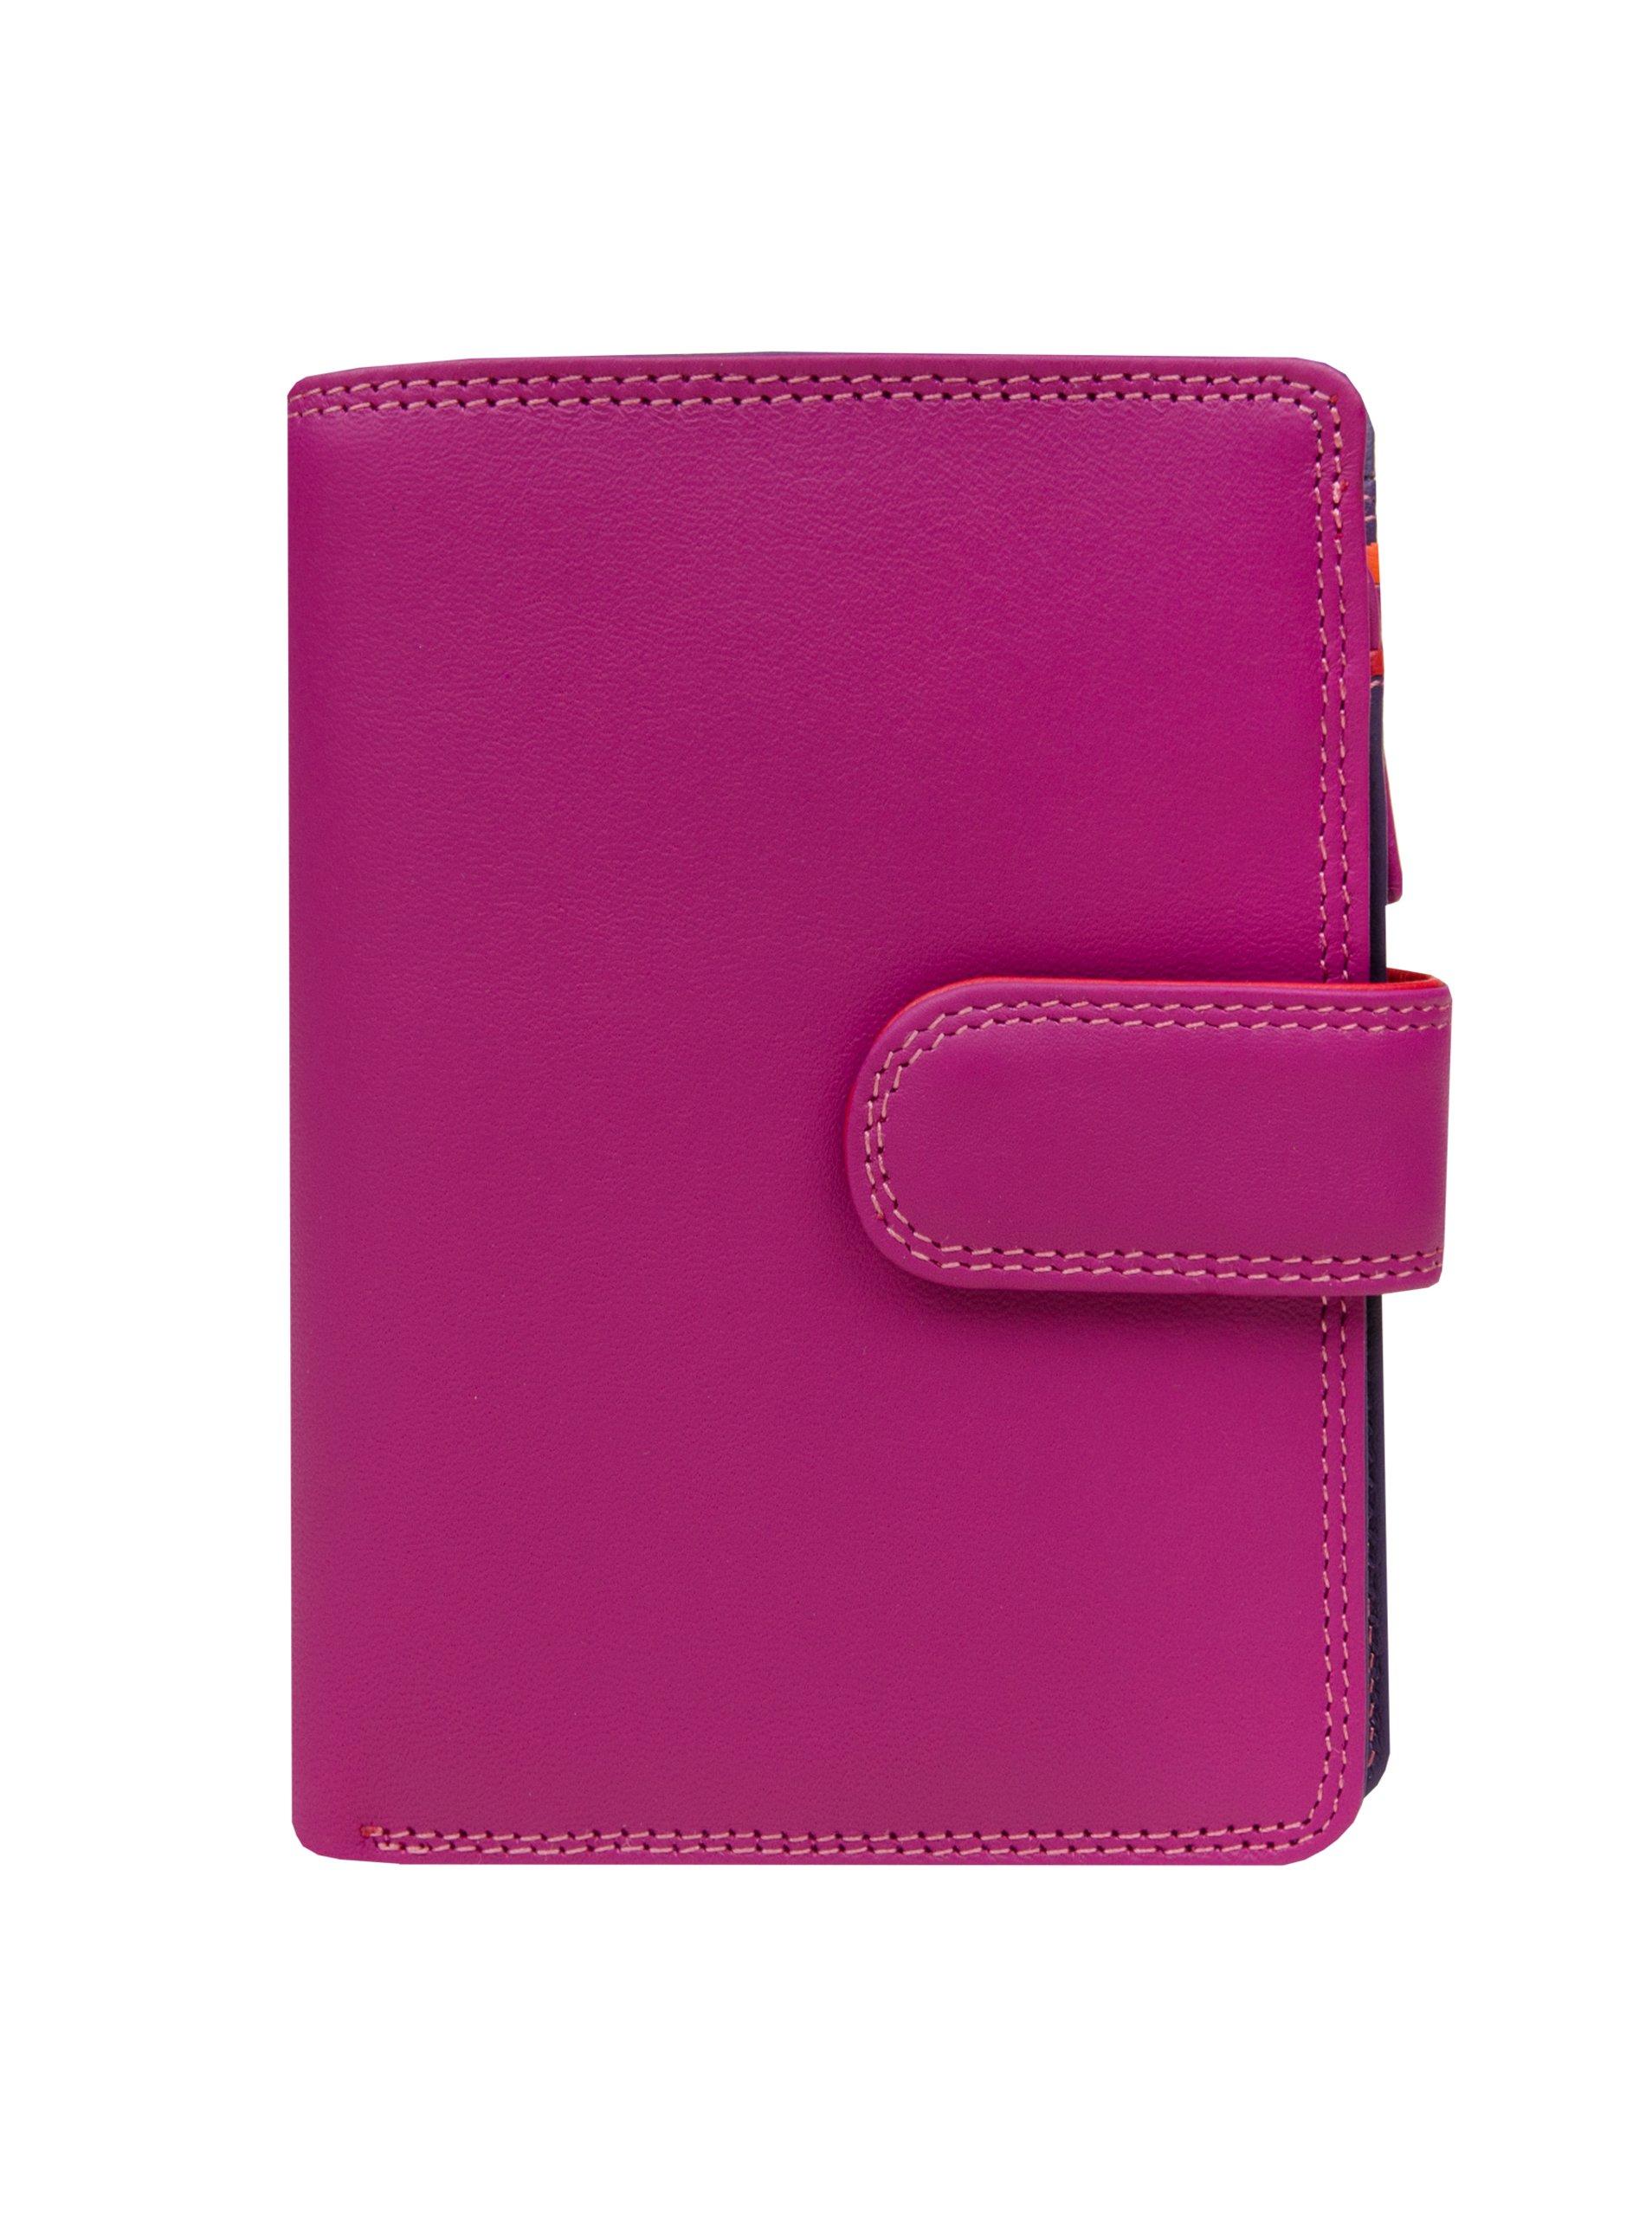 Peněženka Mywalit Medium 10 C/C Wallet w/Zip purse Sangria Multi